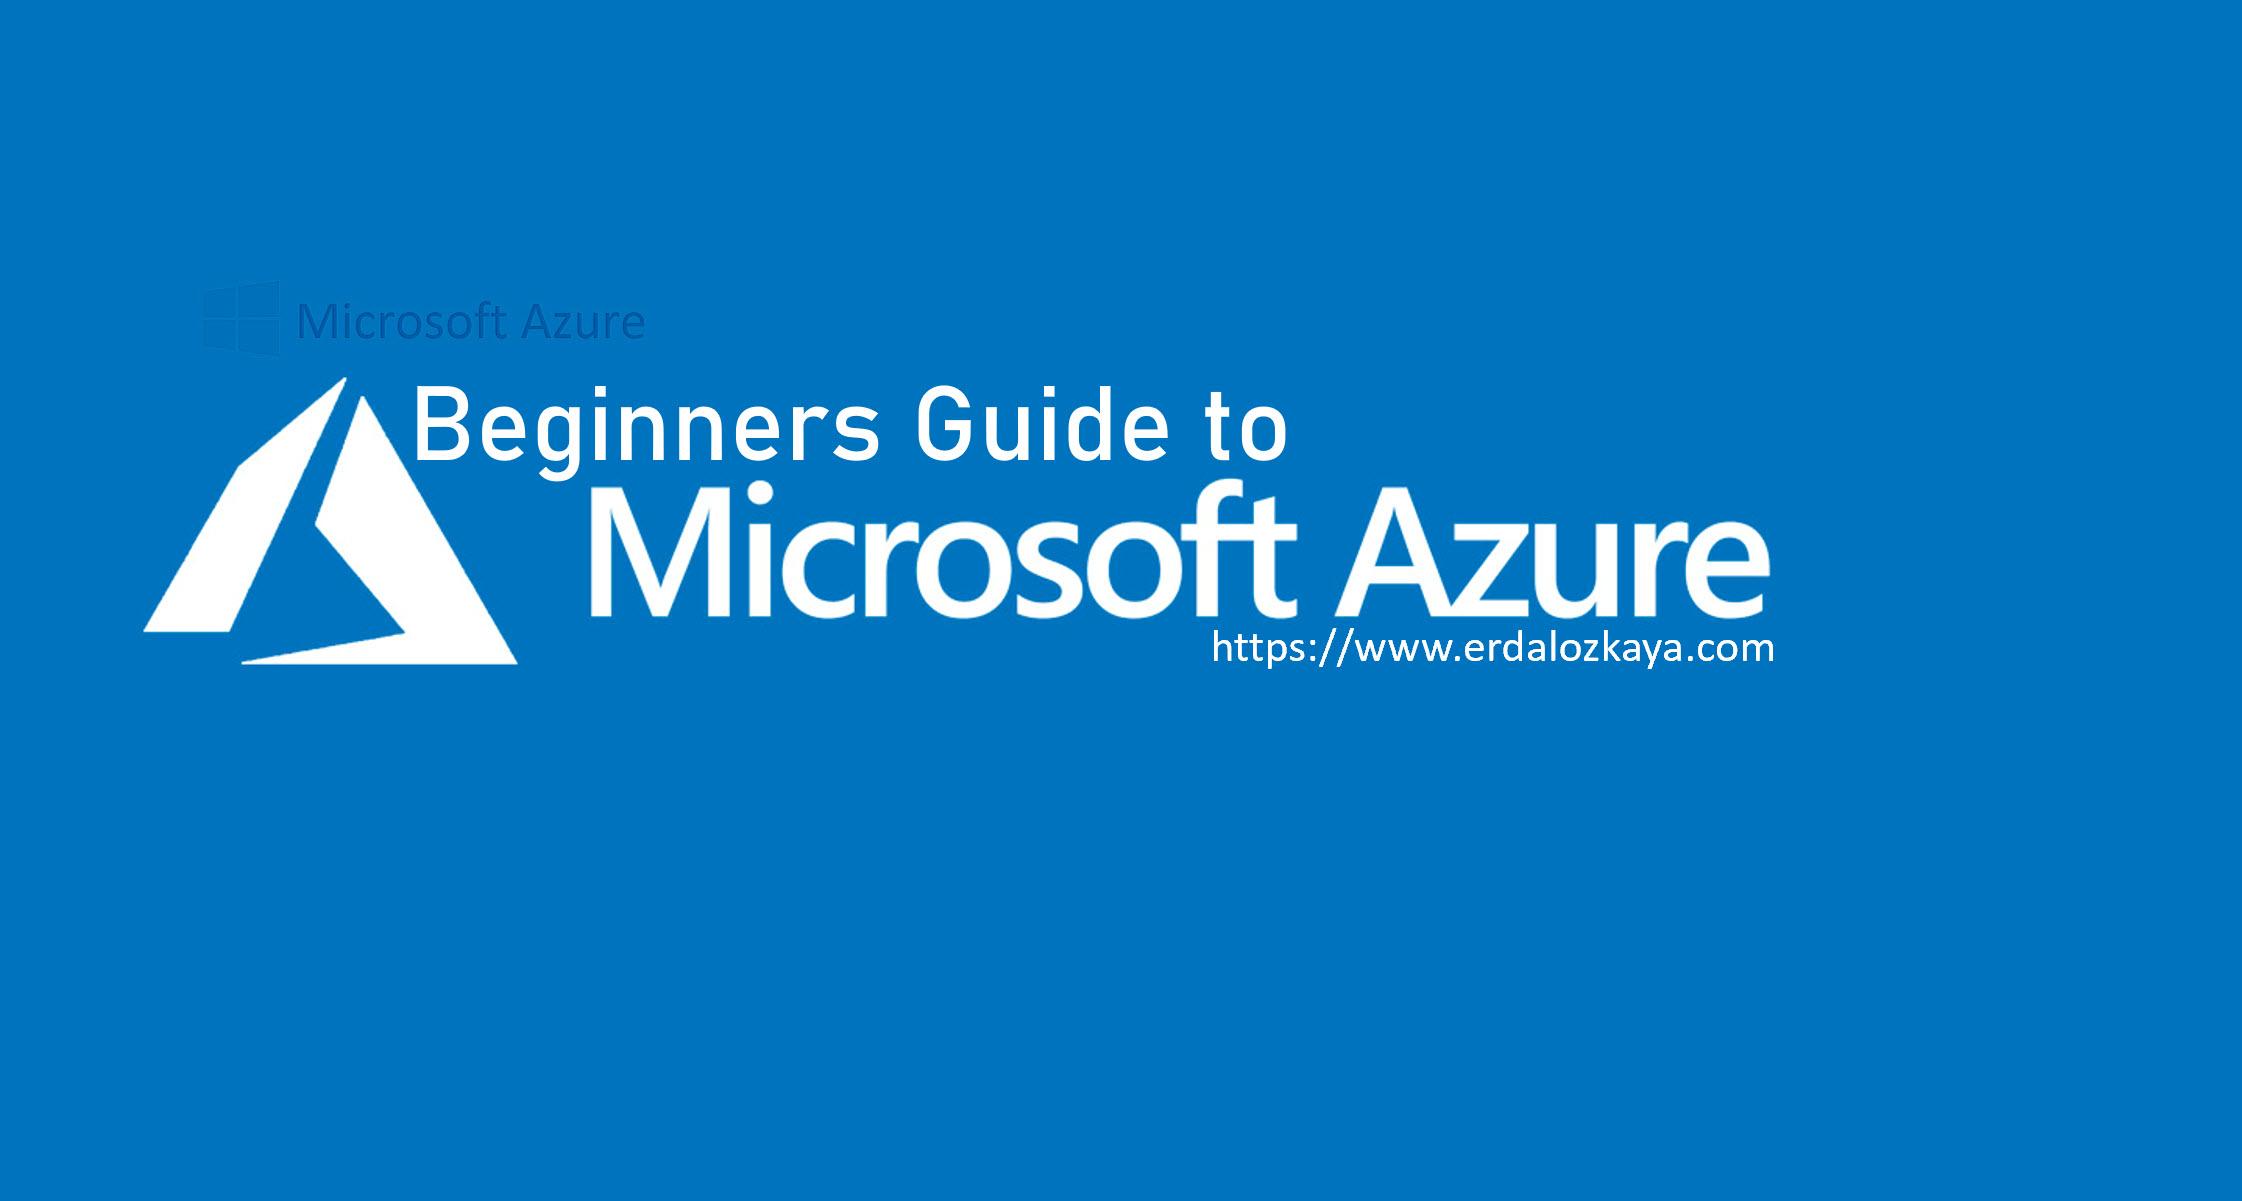 Beginner's Guide to Microsoft Azure